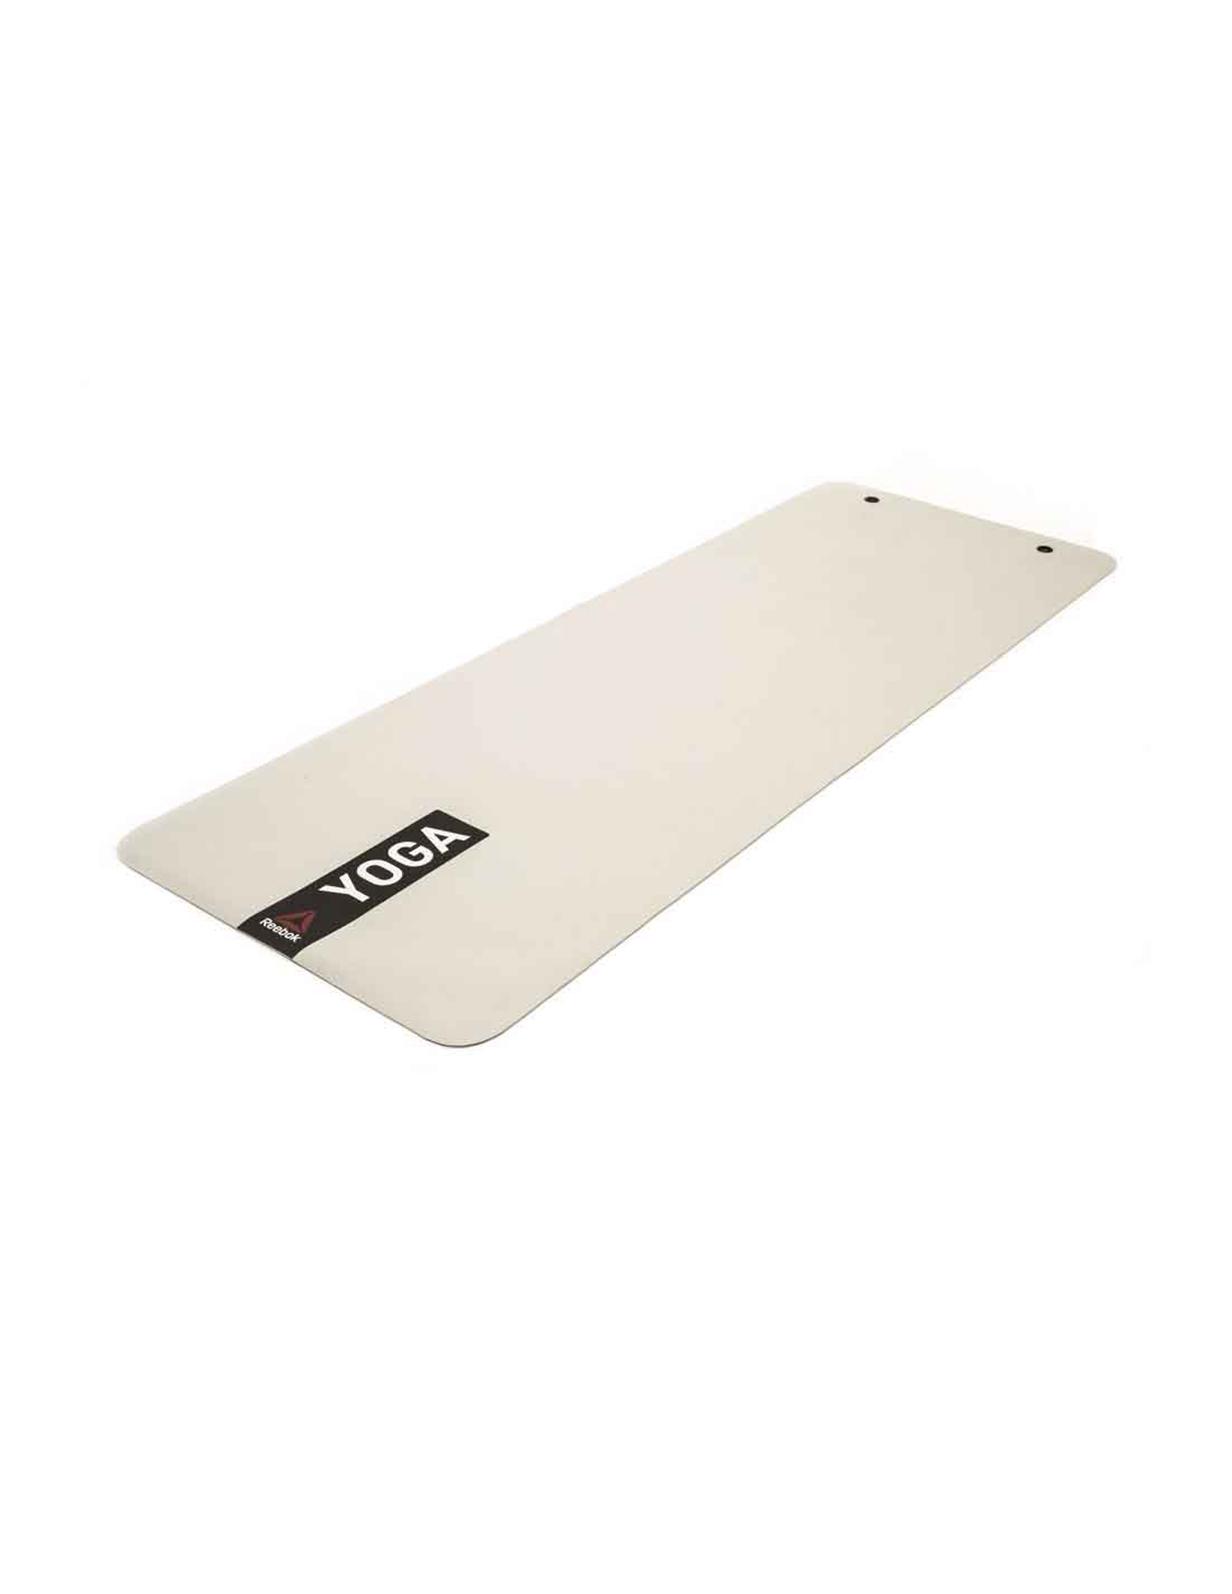 RSYG-16024 Yoga Mat